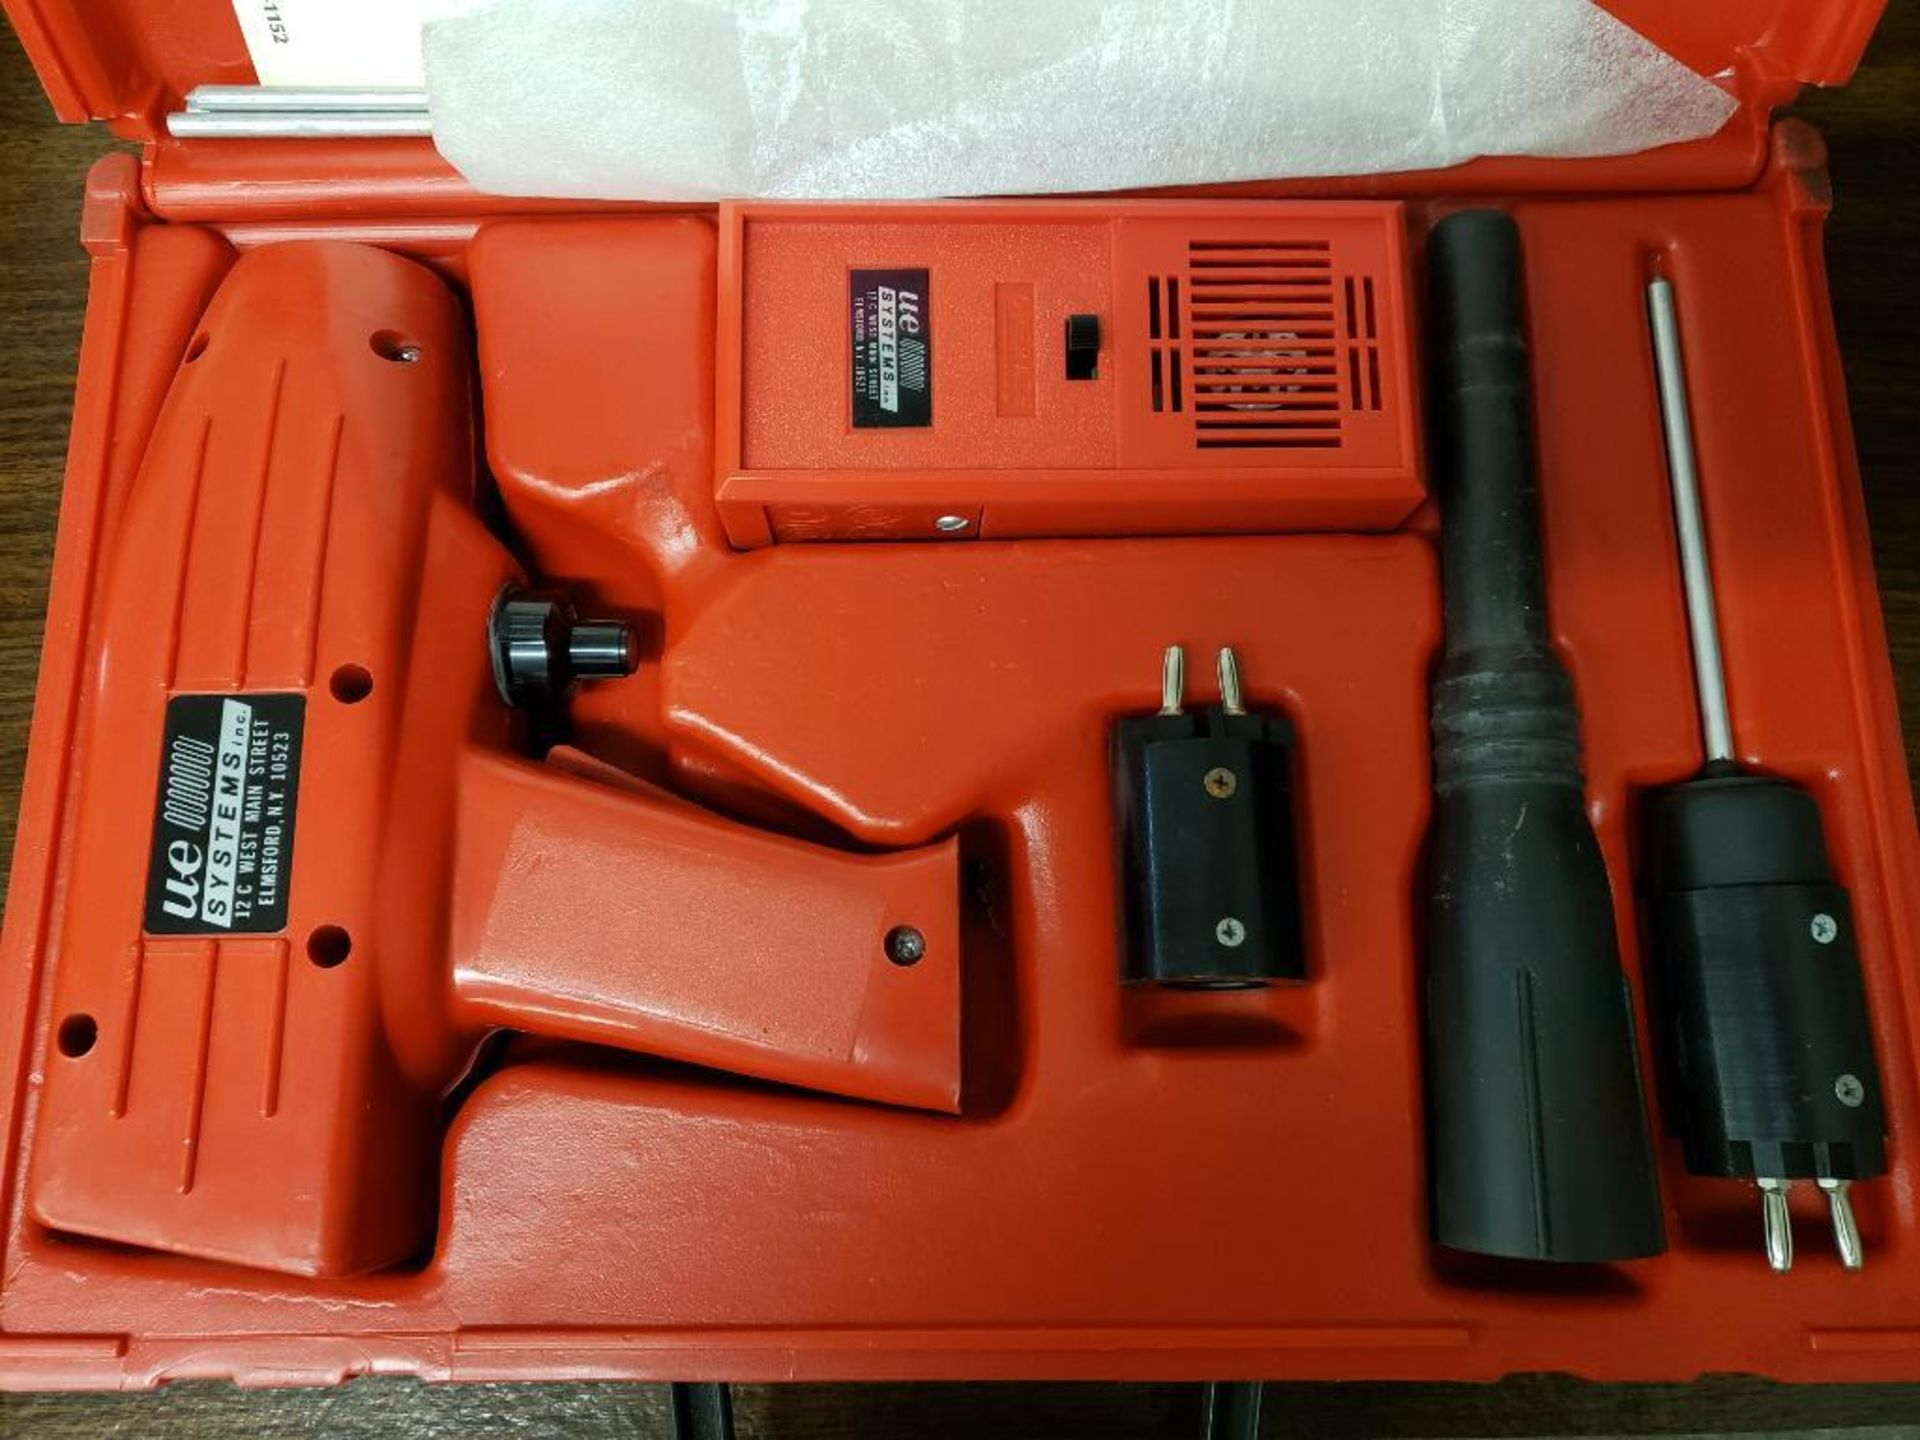 Lot 509 - UE model SST trouble shooter test unit.